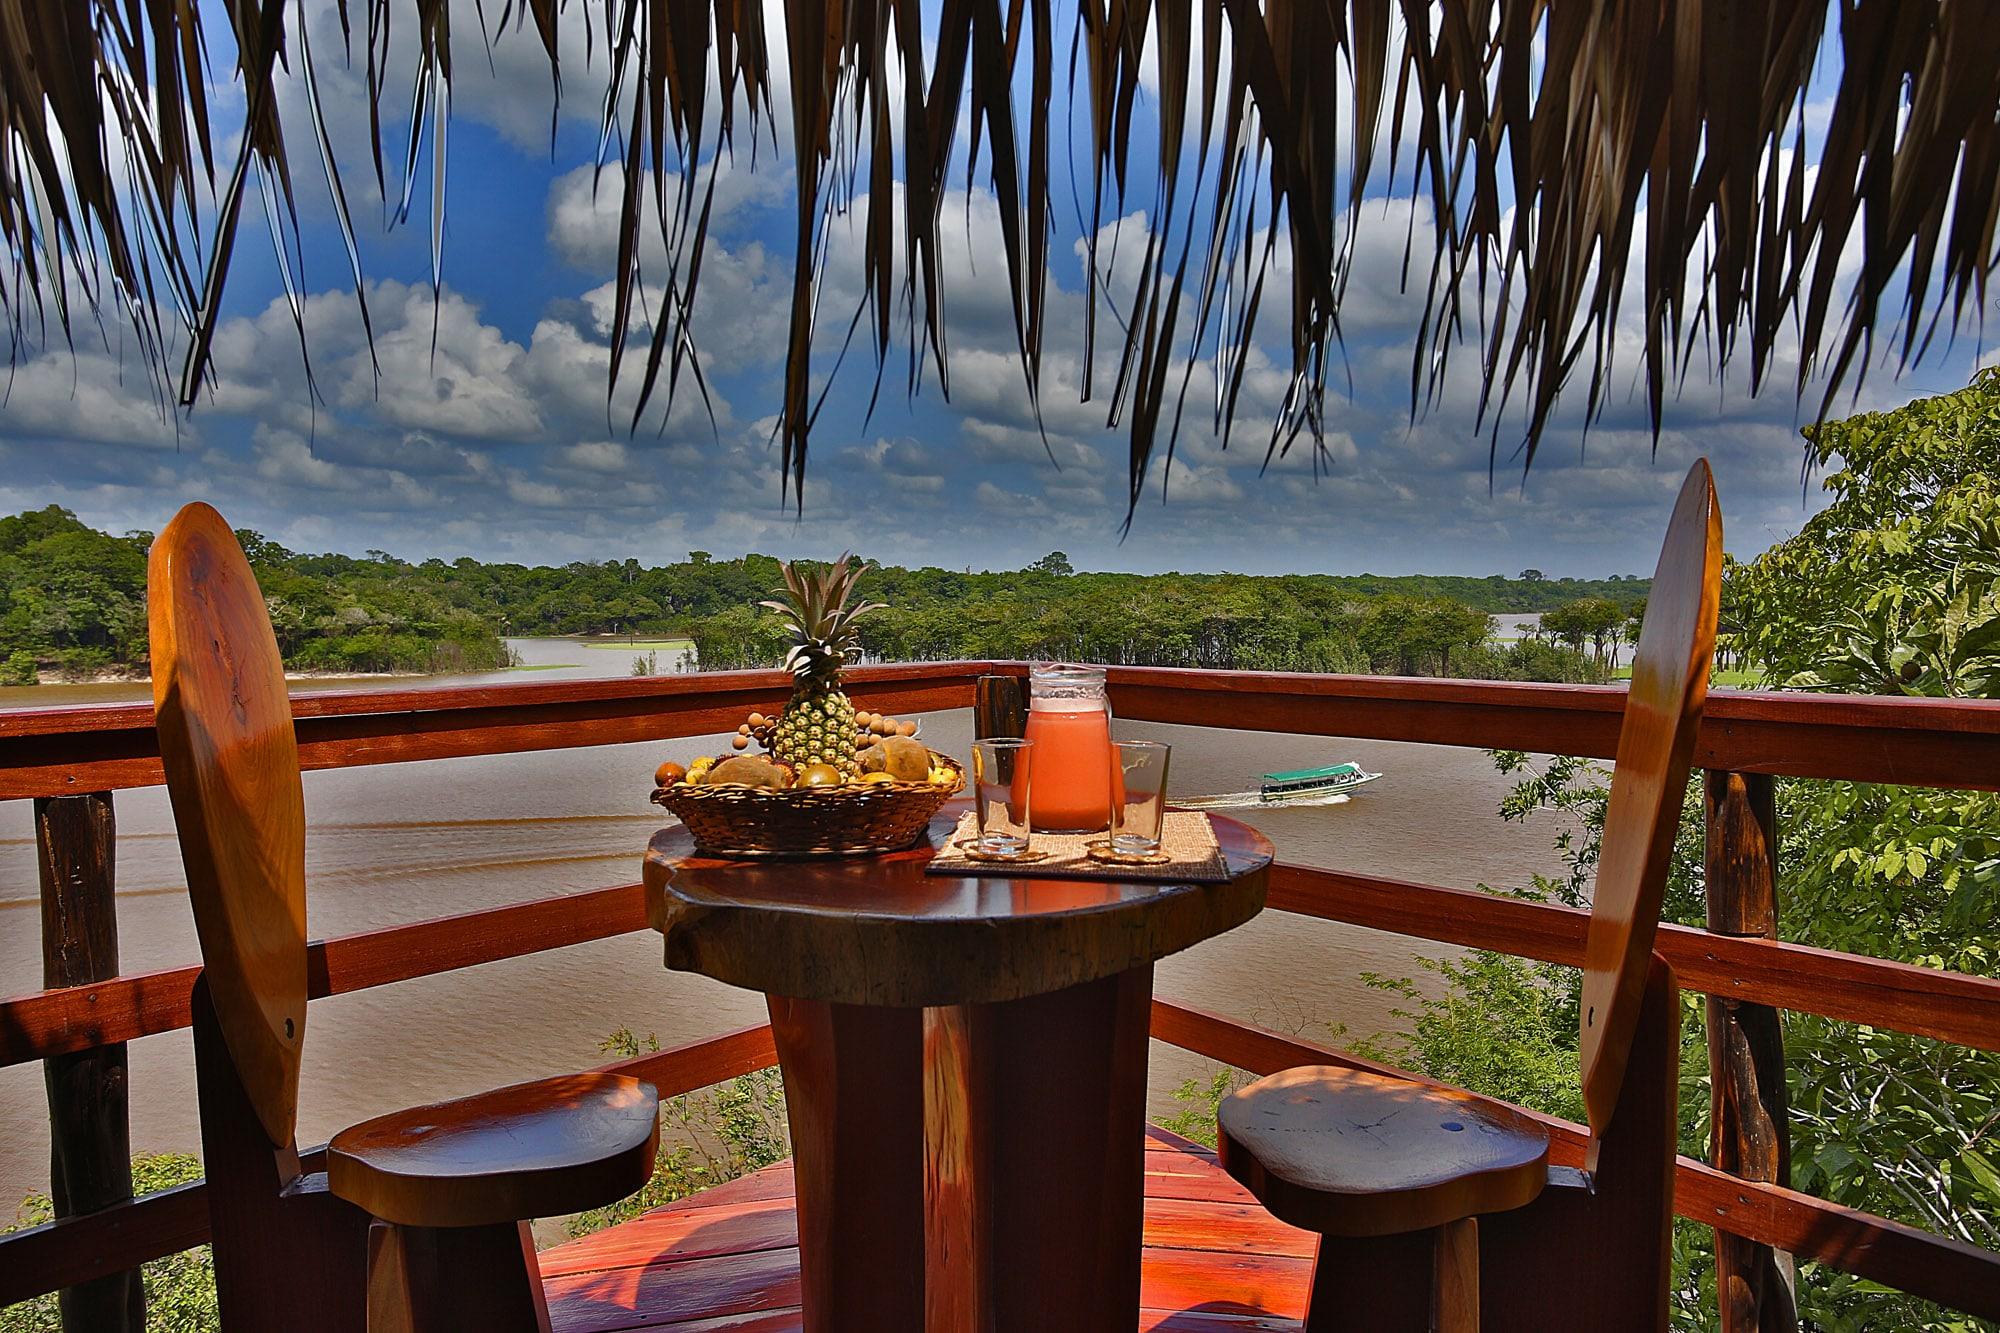 Breakfast at the Juma Lodge, Amazon, Brazil